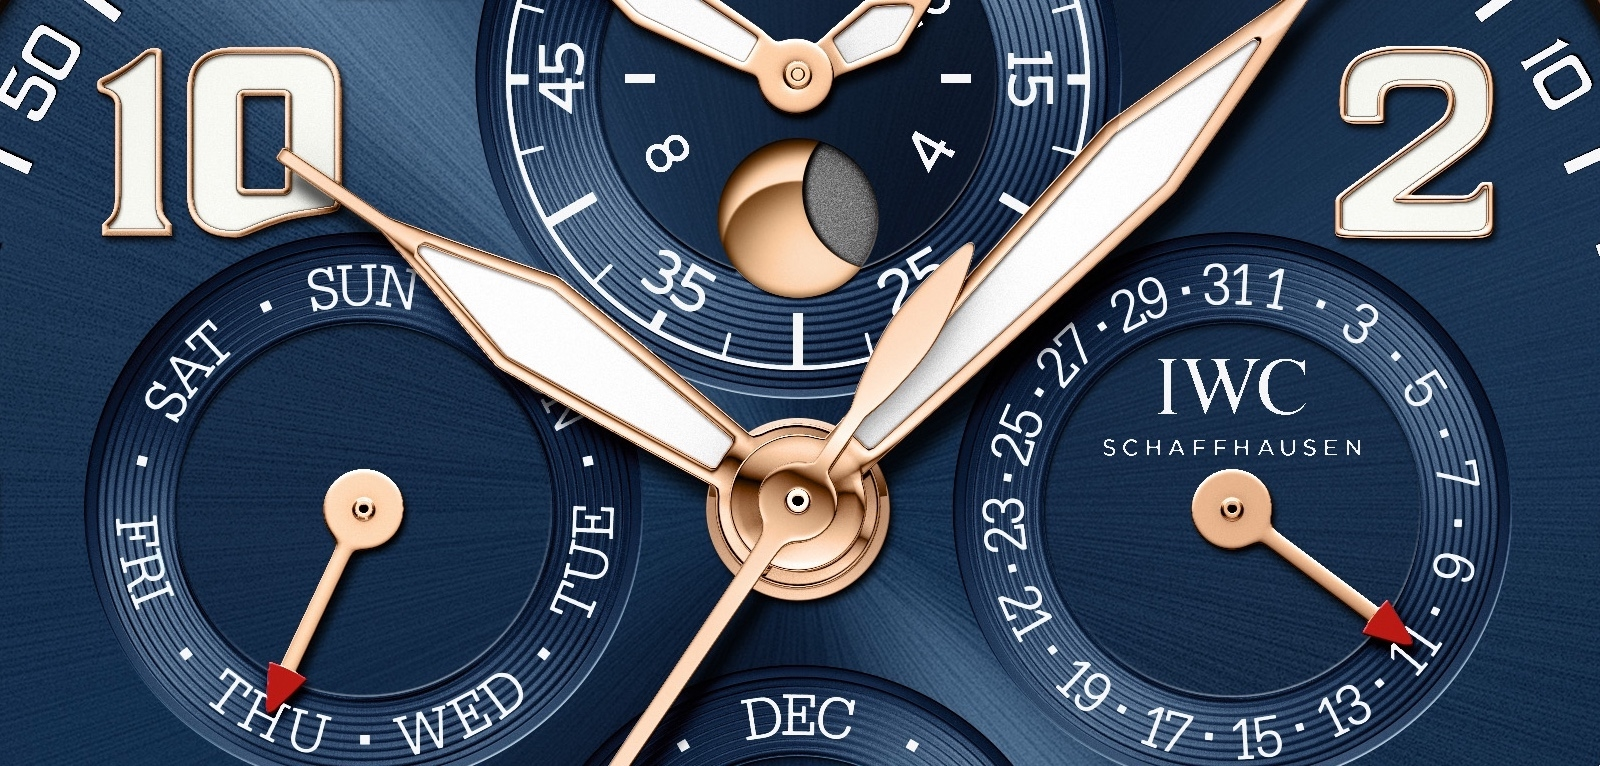 IWC Pilot's Watch Perpetual Calendar Chronograph Le Petit Prince.